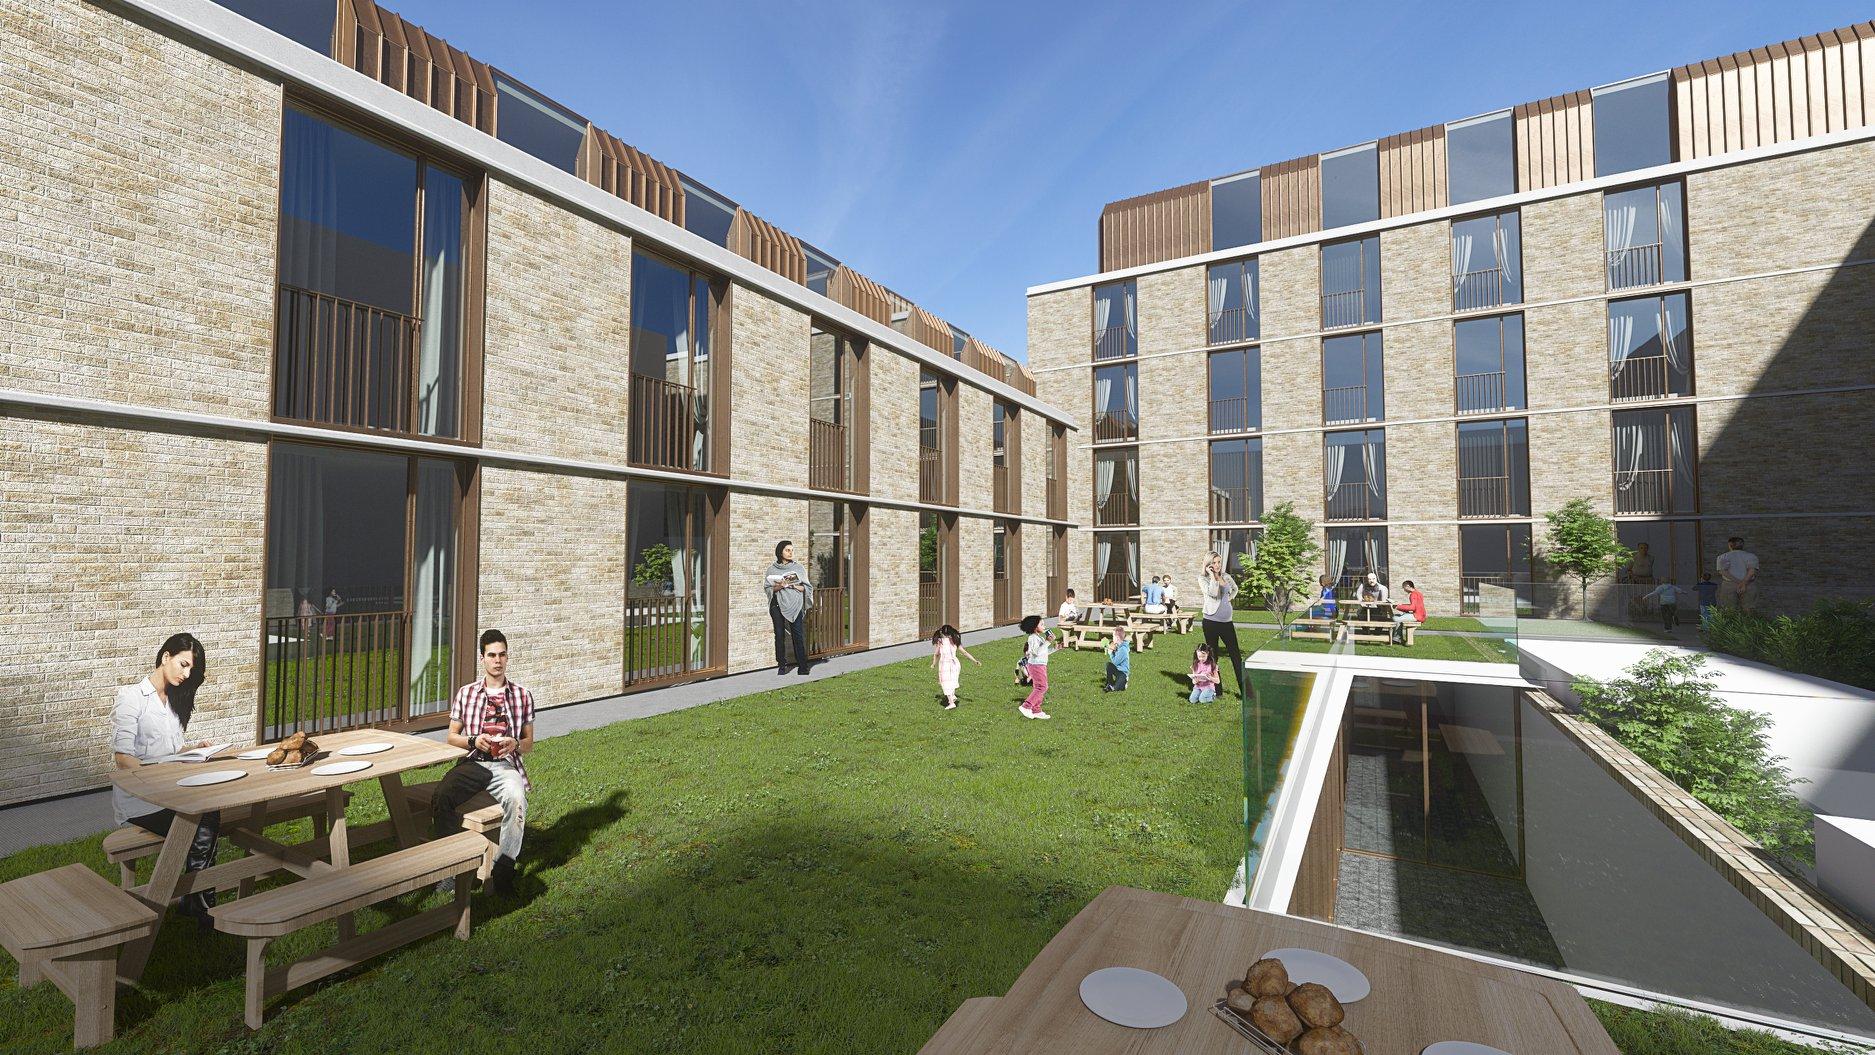 Melt Homes Project at 68-86 Clapham Road, Kennington - Roof Garden CGI